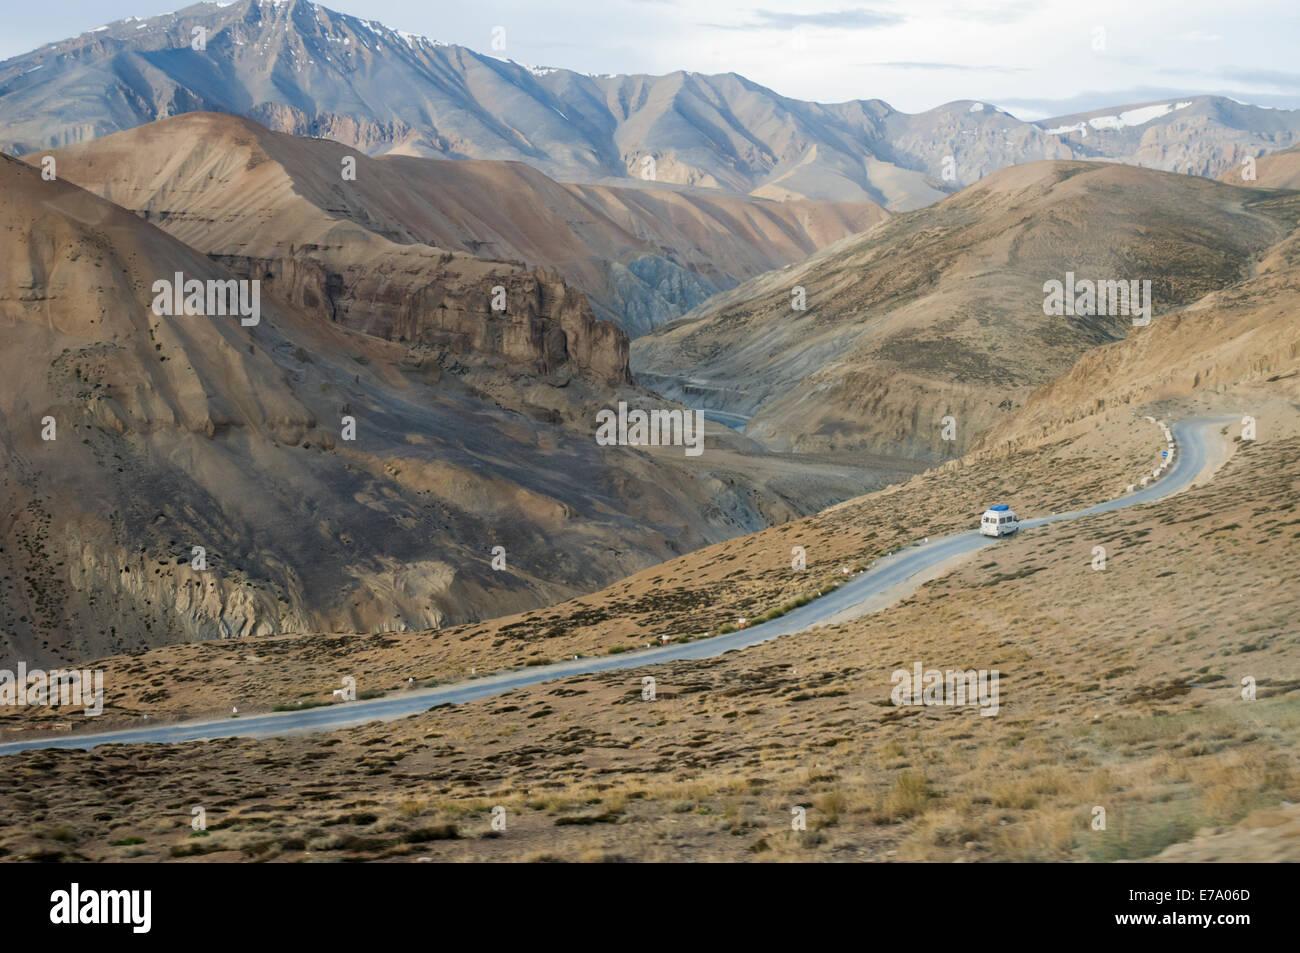 On the Leh to Manali road, south of the Tanglang or Taglang La (pass) - Stock Image